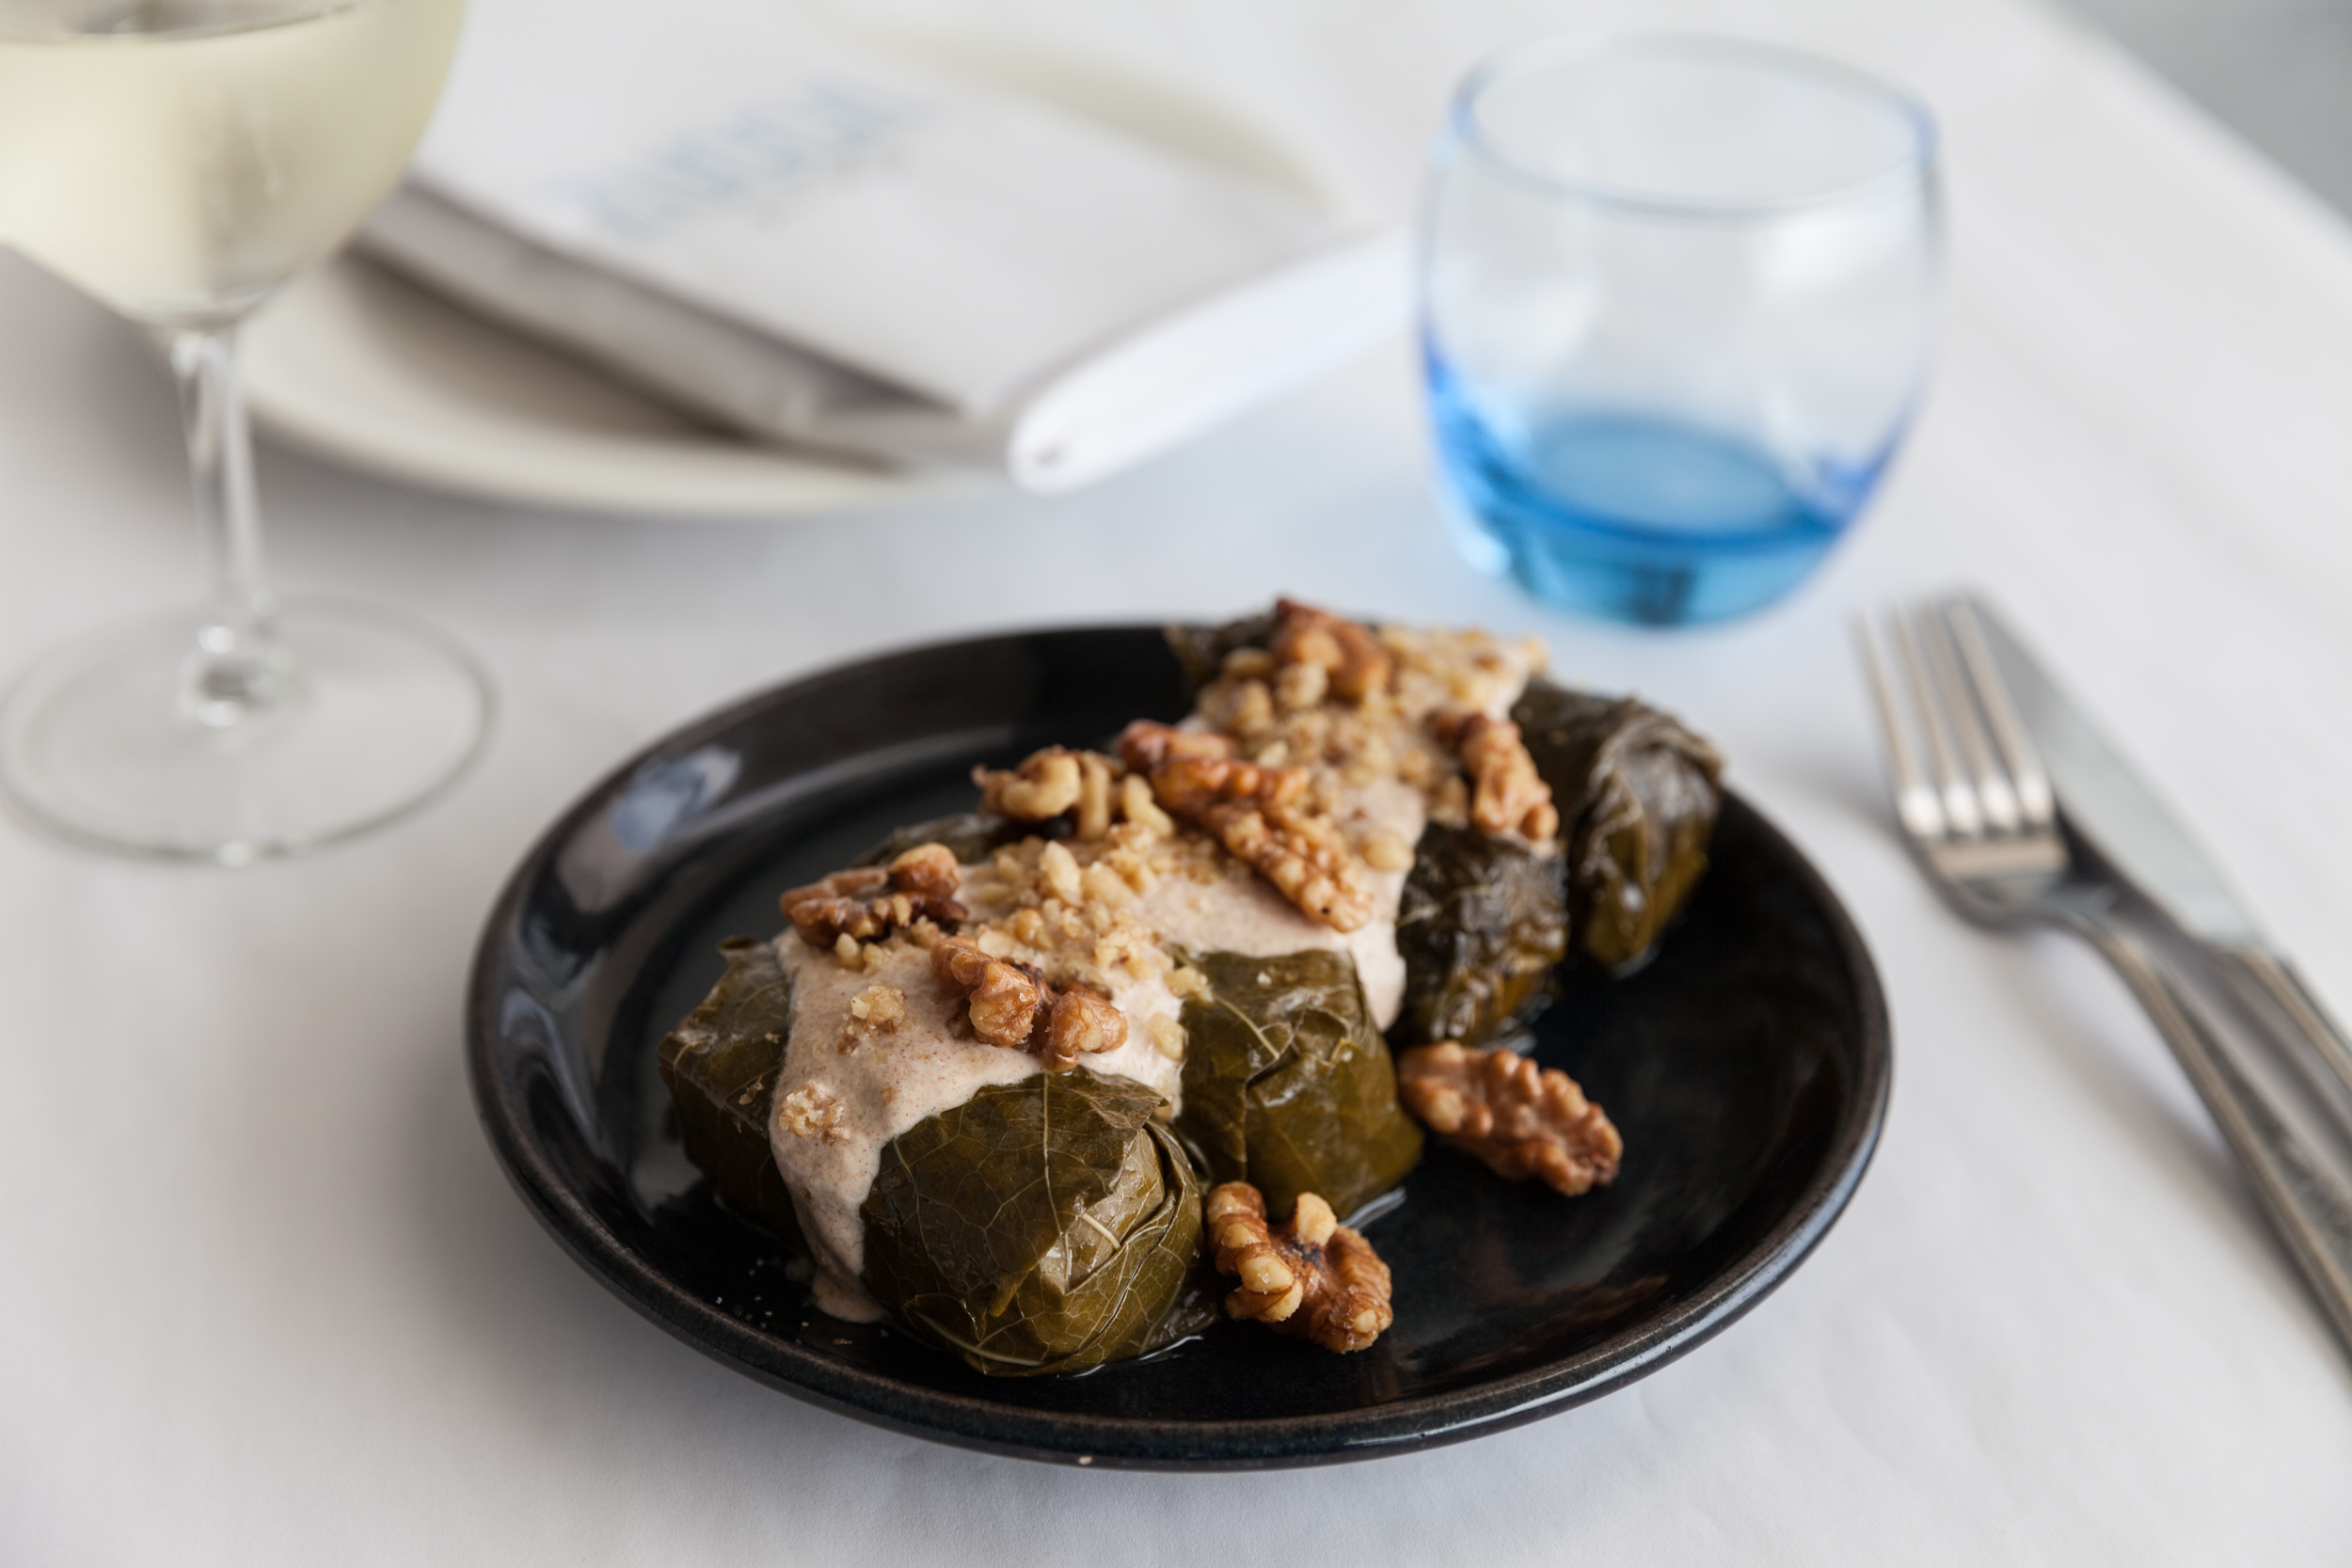 Vine dolmades at Zucca Greek Mezze